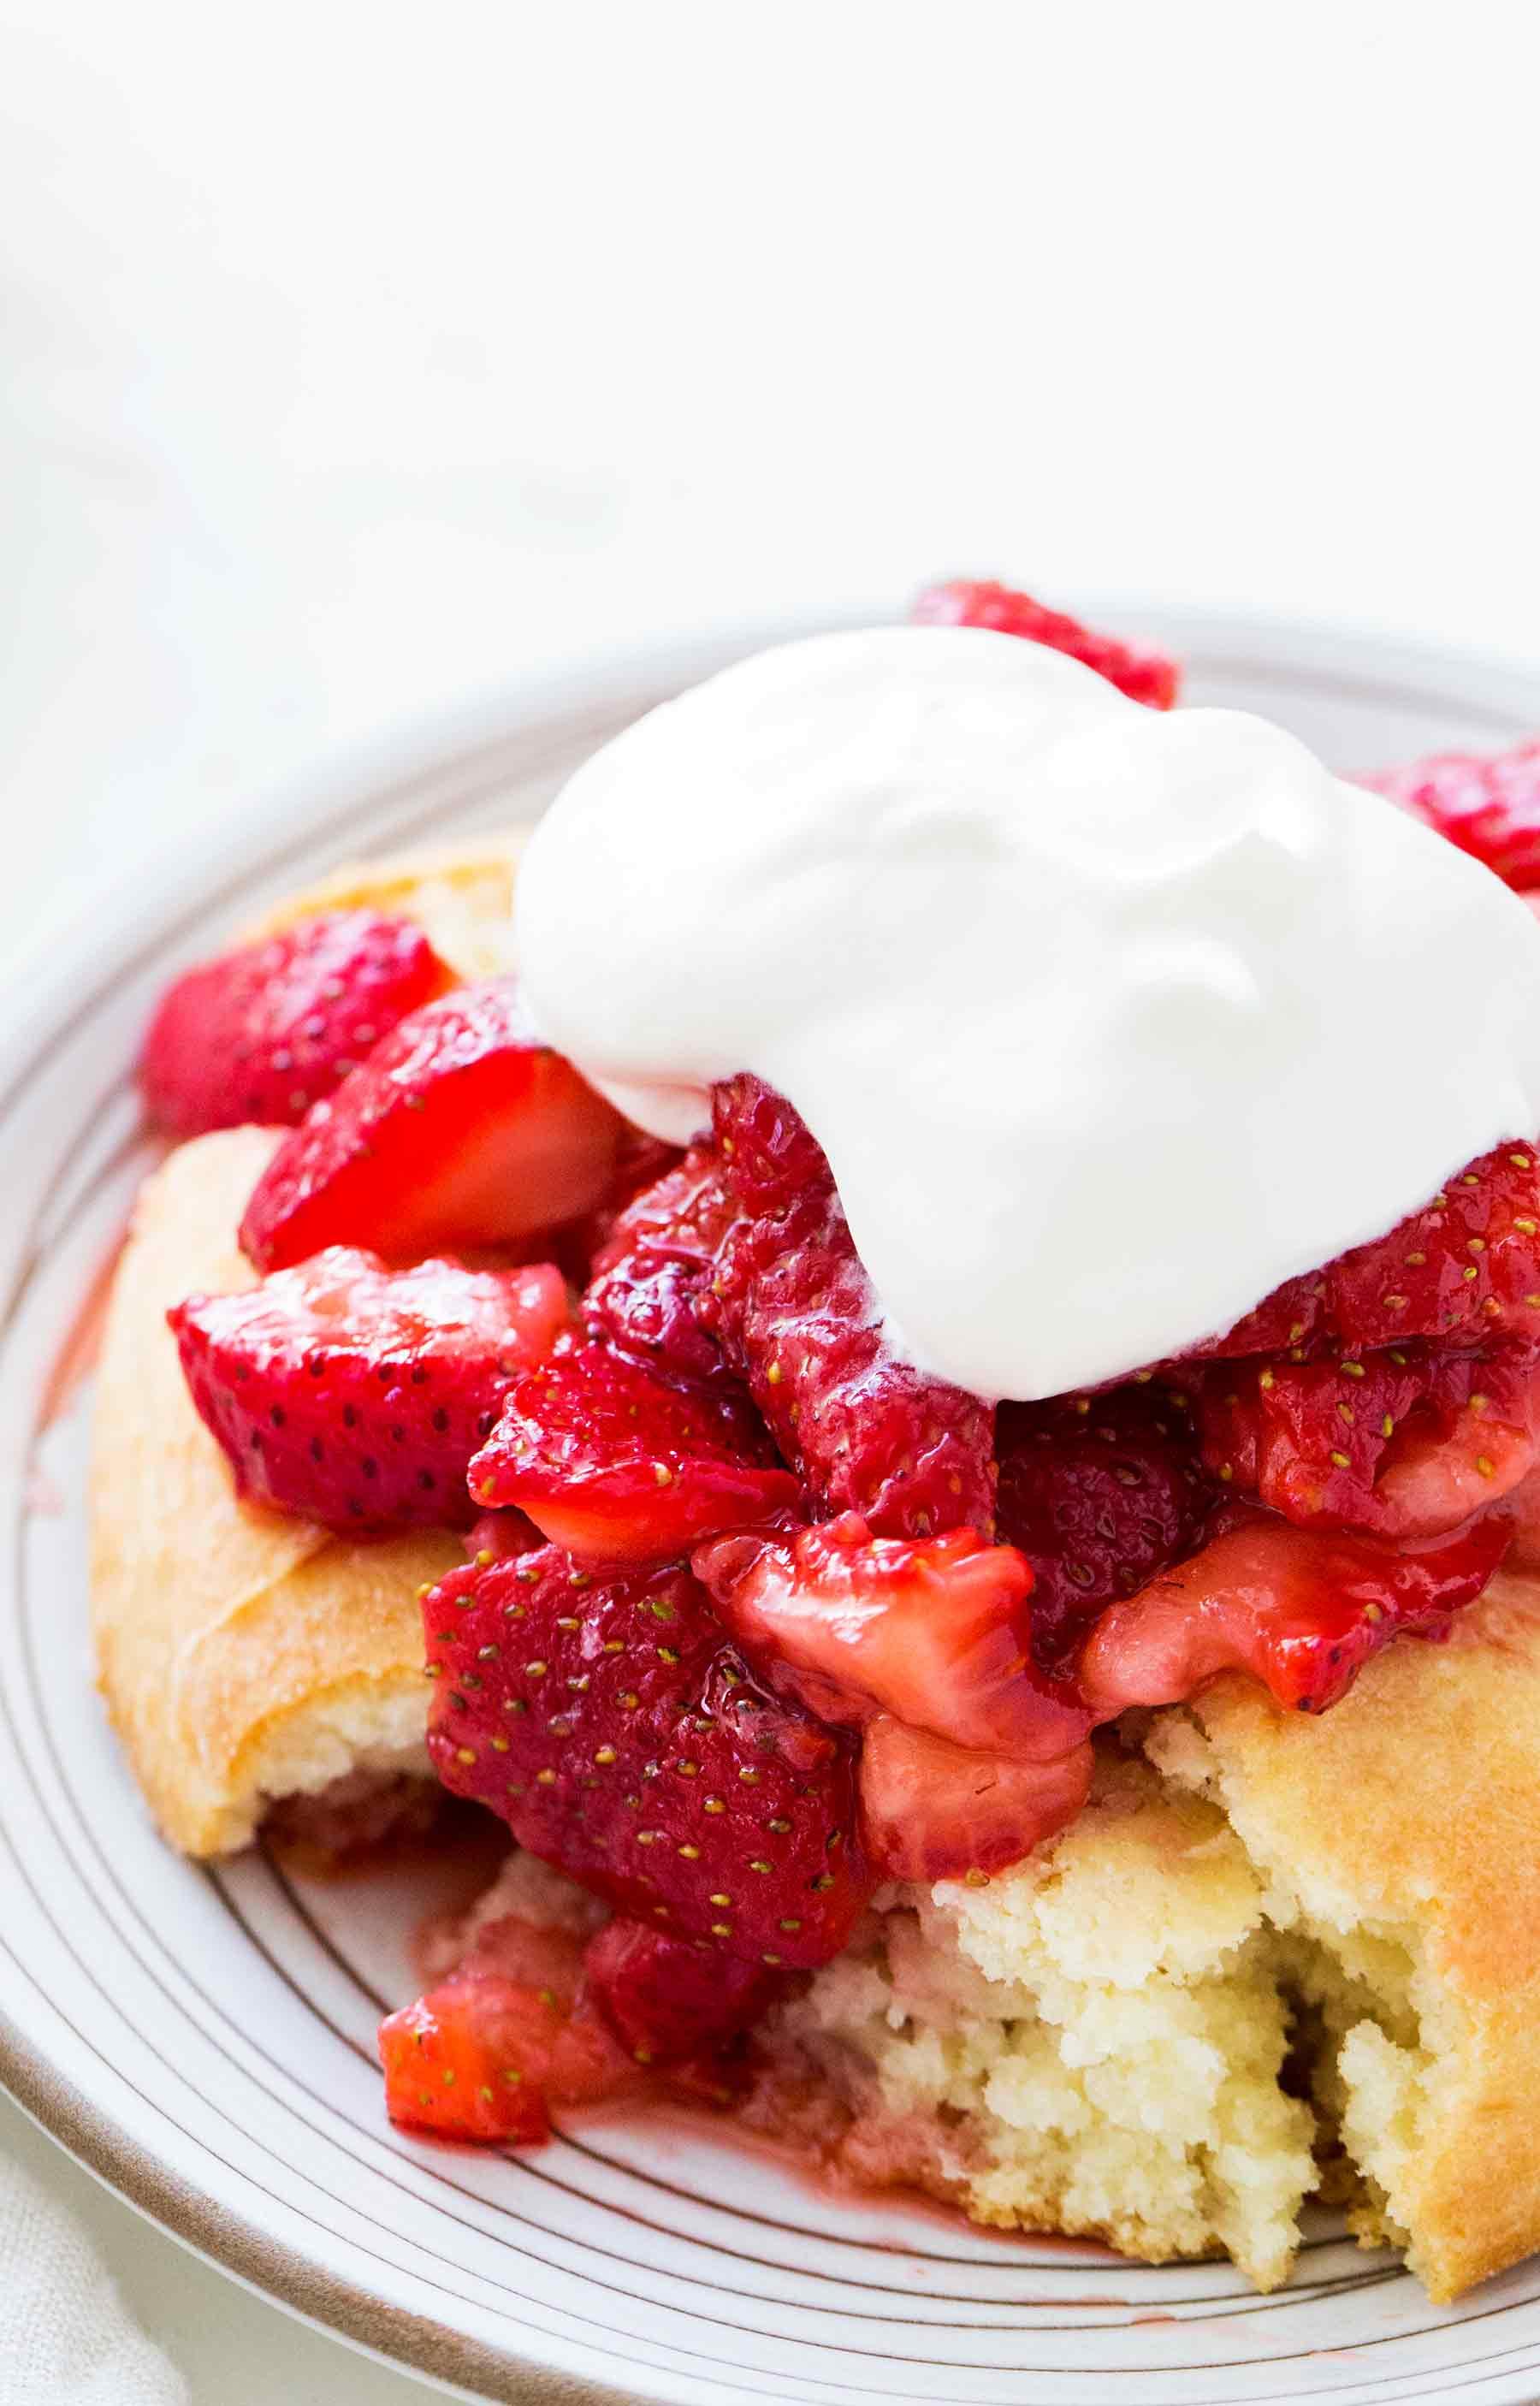 Strawberry Shortcake Backgrounds, Compatible - PC, Mobile, Gadgets| 1800x2812 px